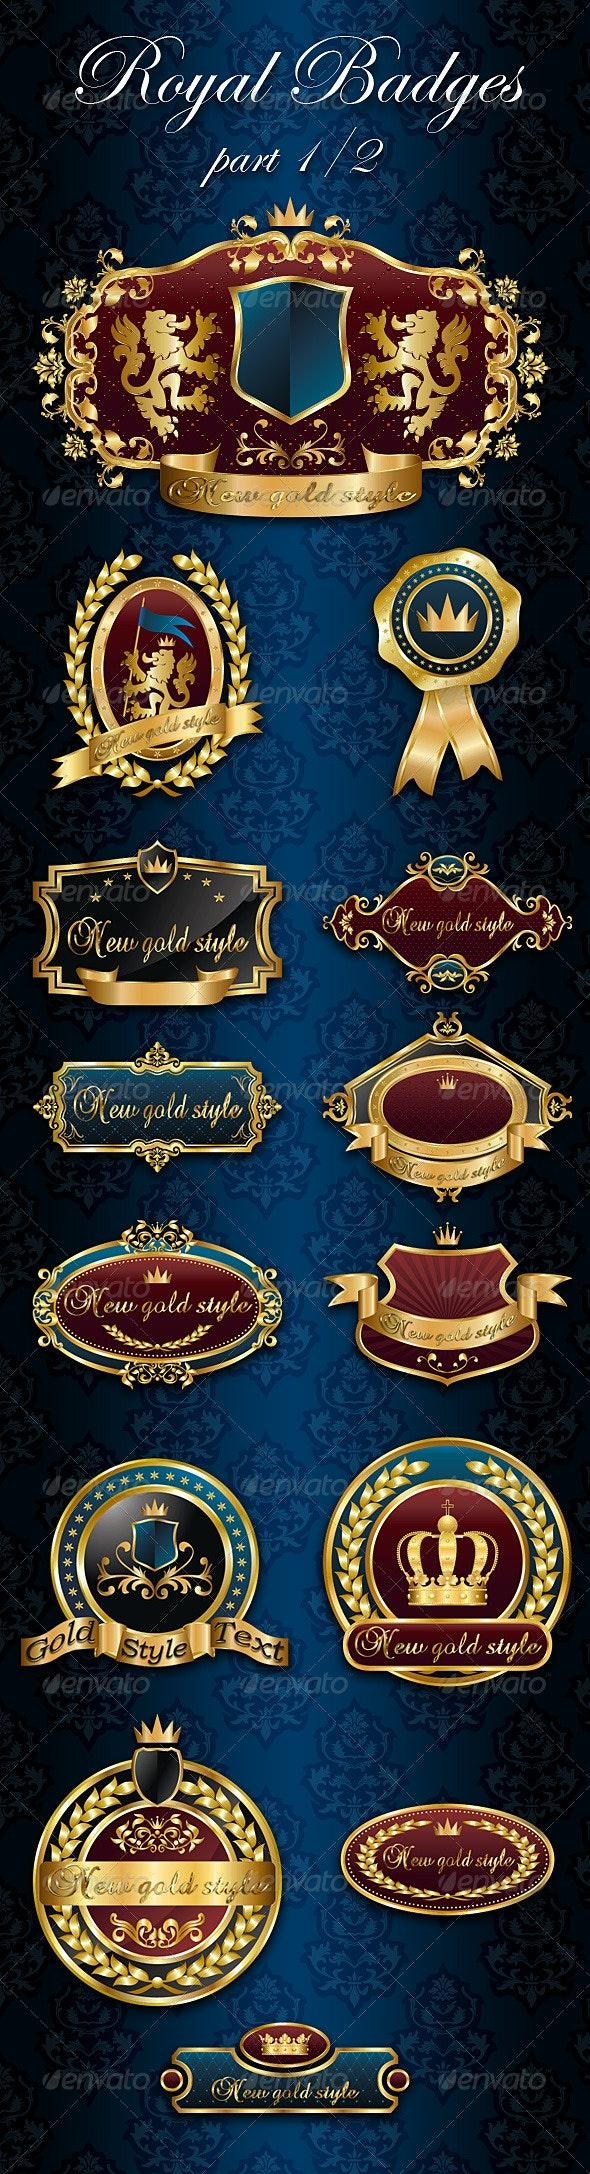 Royal Badges/Frames part 1/2 - Decorative Symbols Decorative